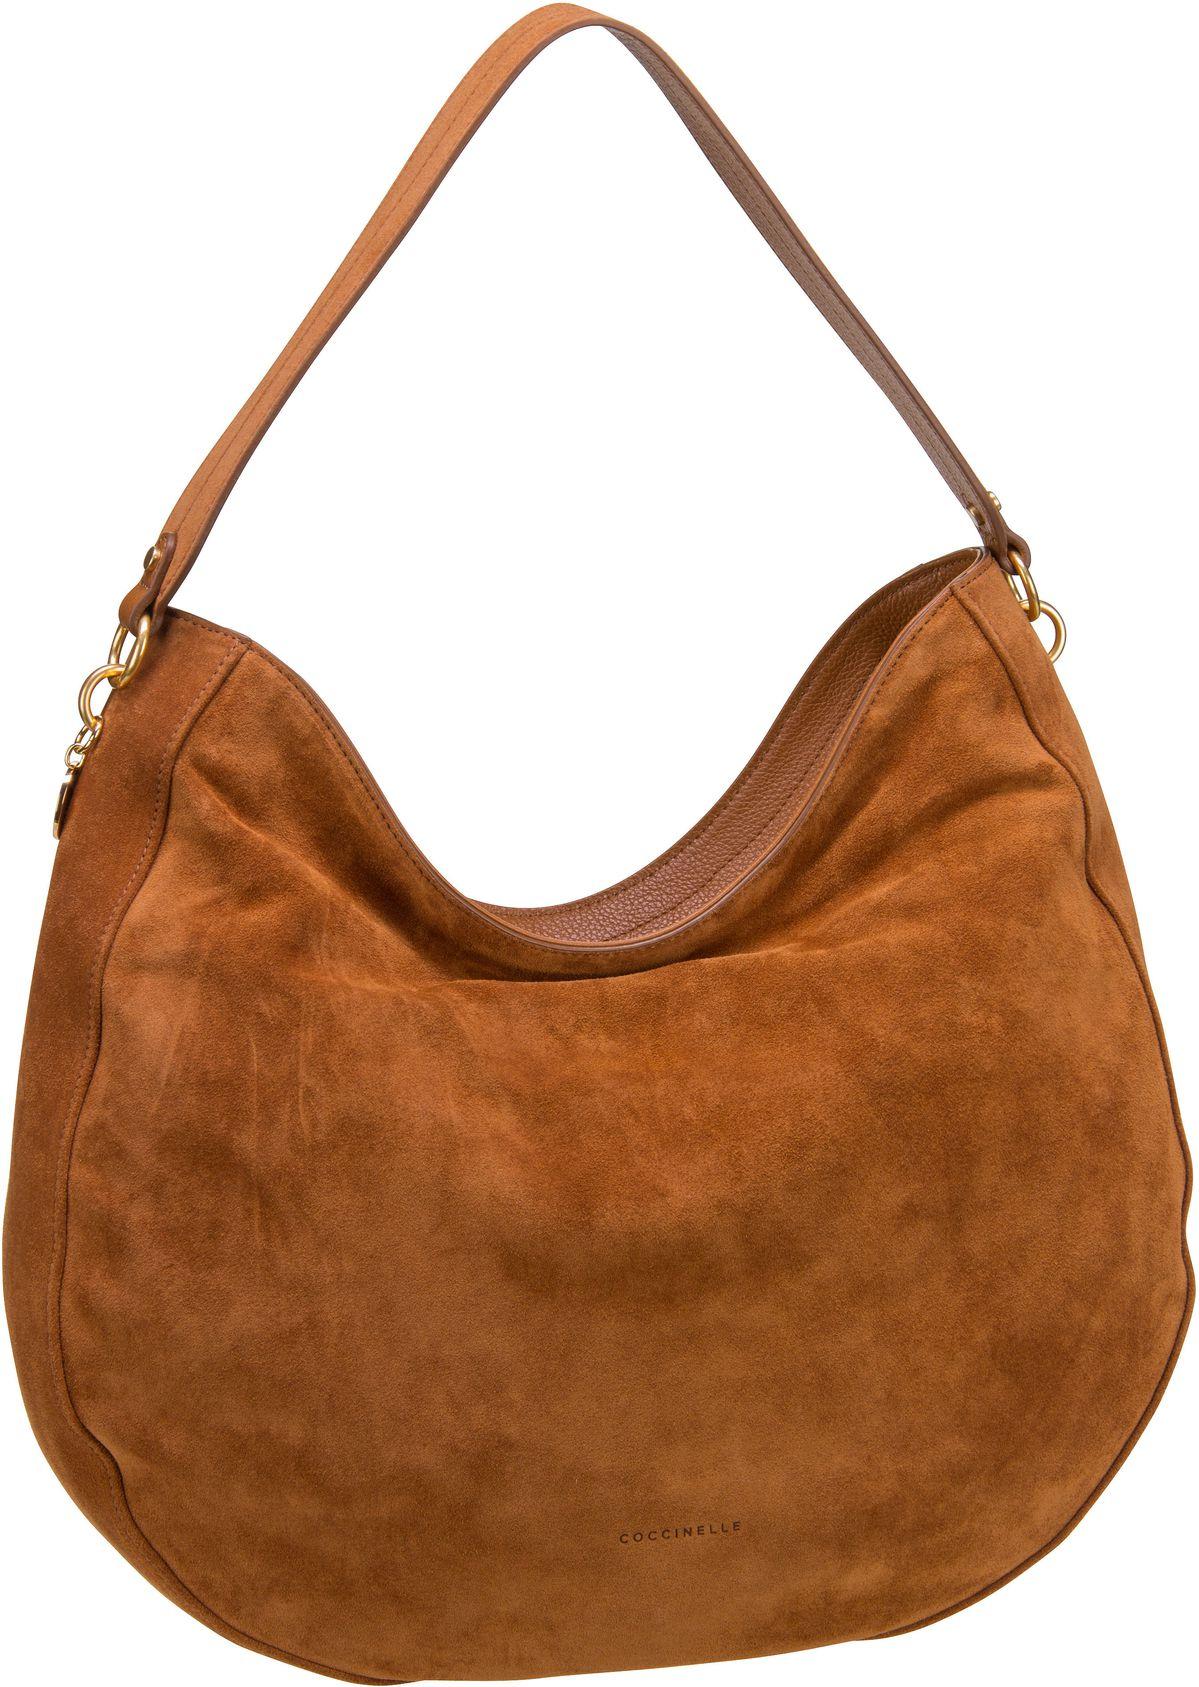 Handtasche Alpha Suede 1301 Caramel